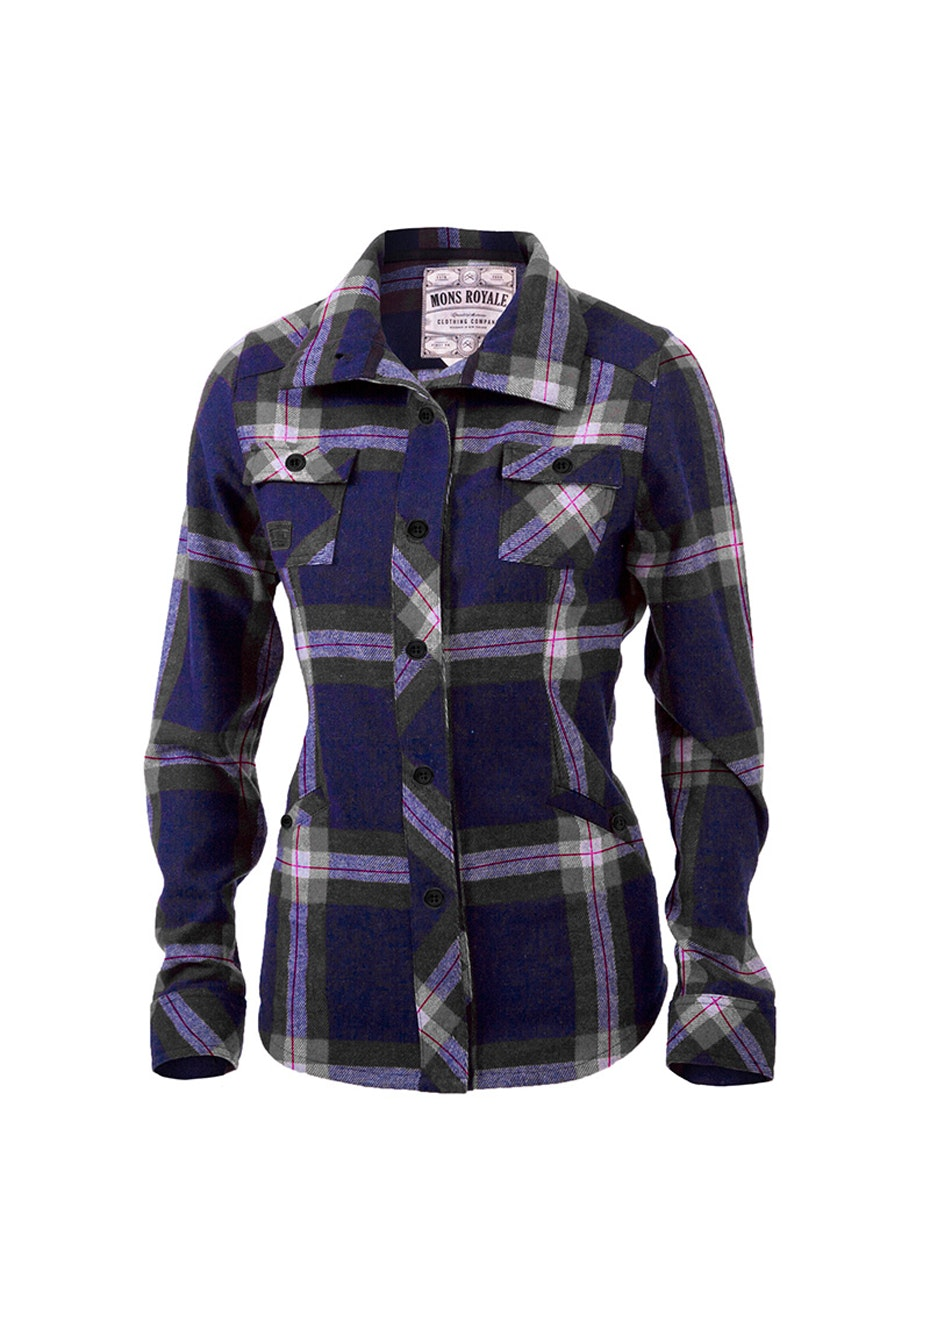 Mons Royale - Mountain Shirt - Navy / Charcoal Check